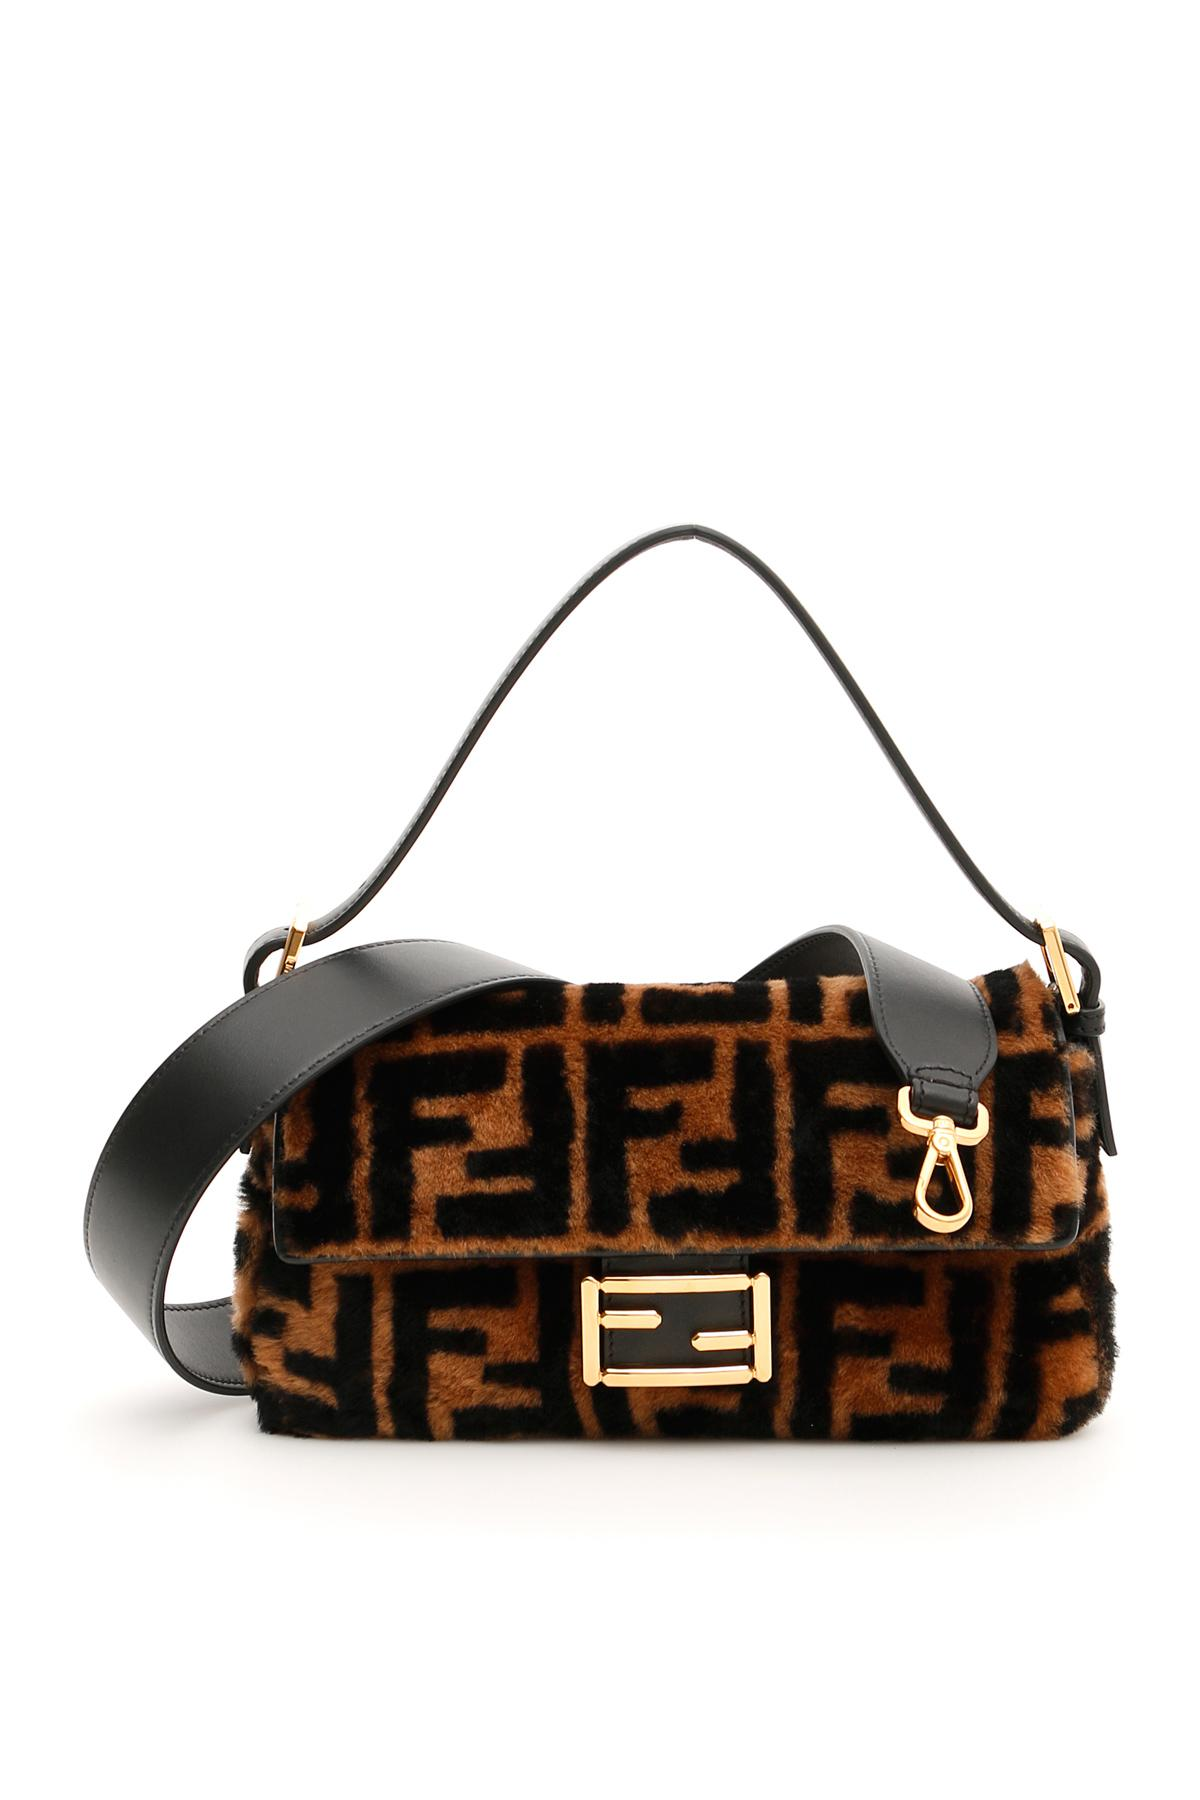 b0d09704d9 Fendi Black Shearling Ff Baguette Bag